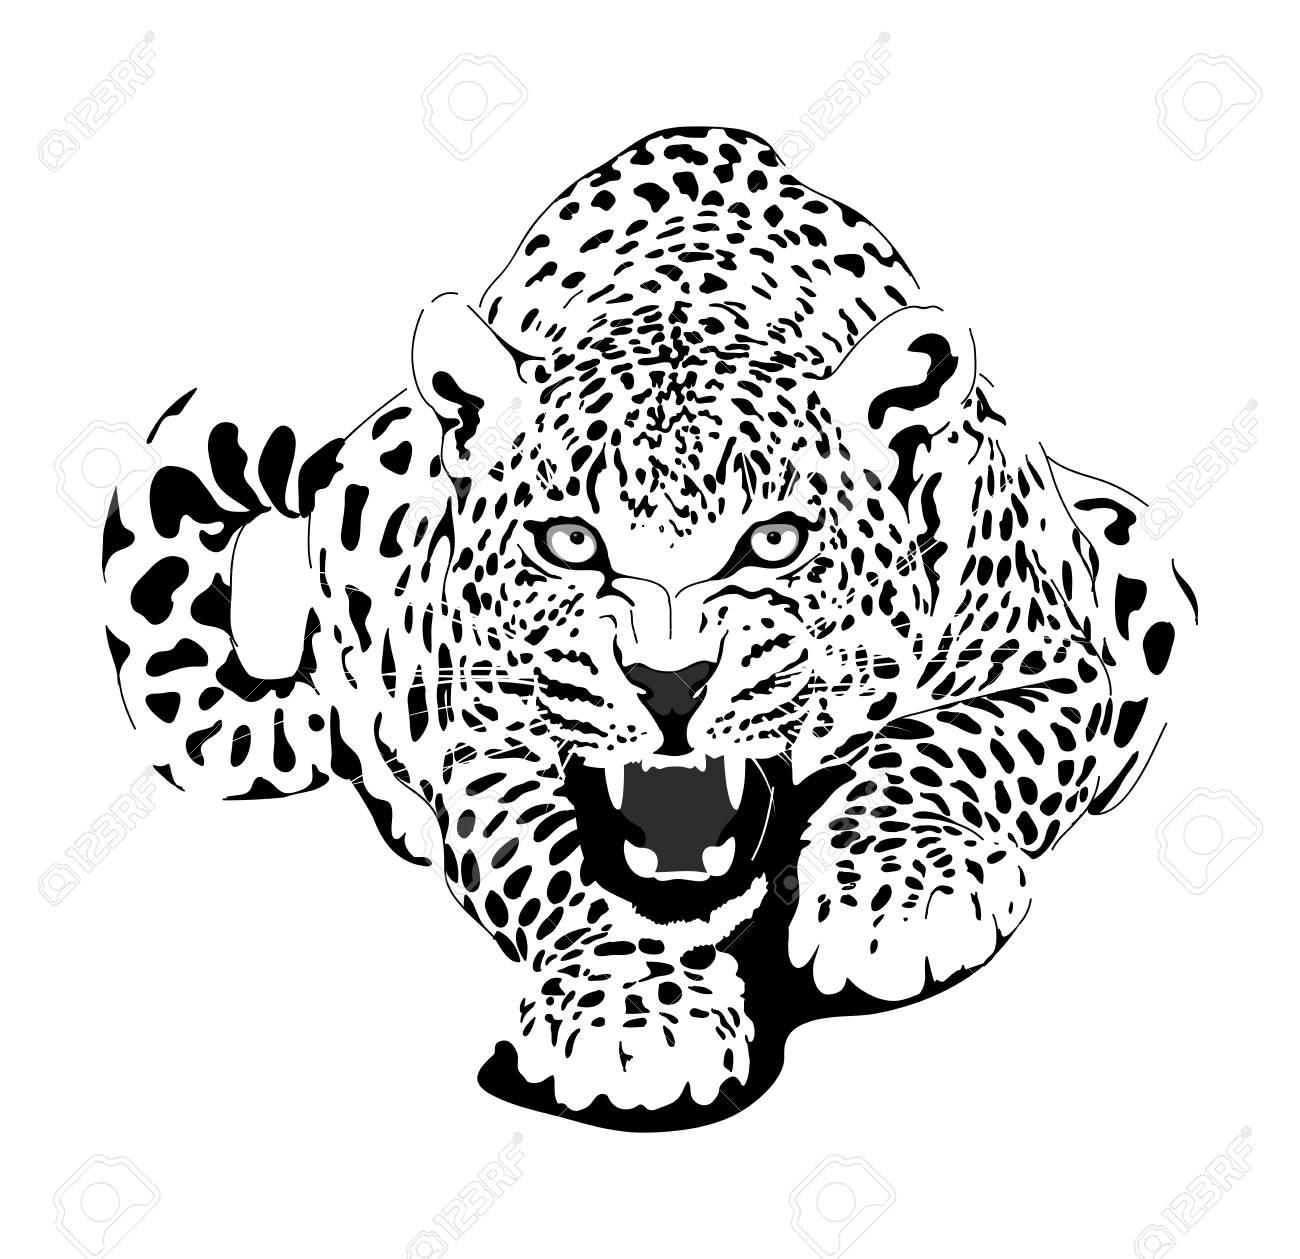 Leopard in black interpretation - 90058859